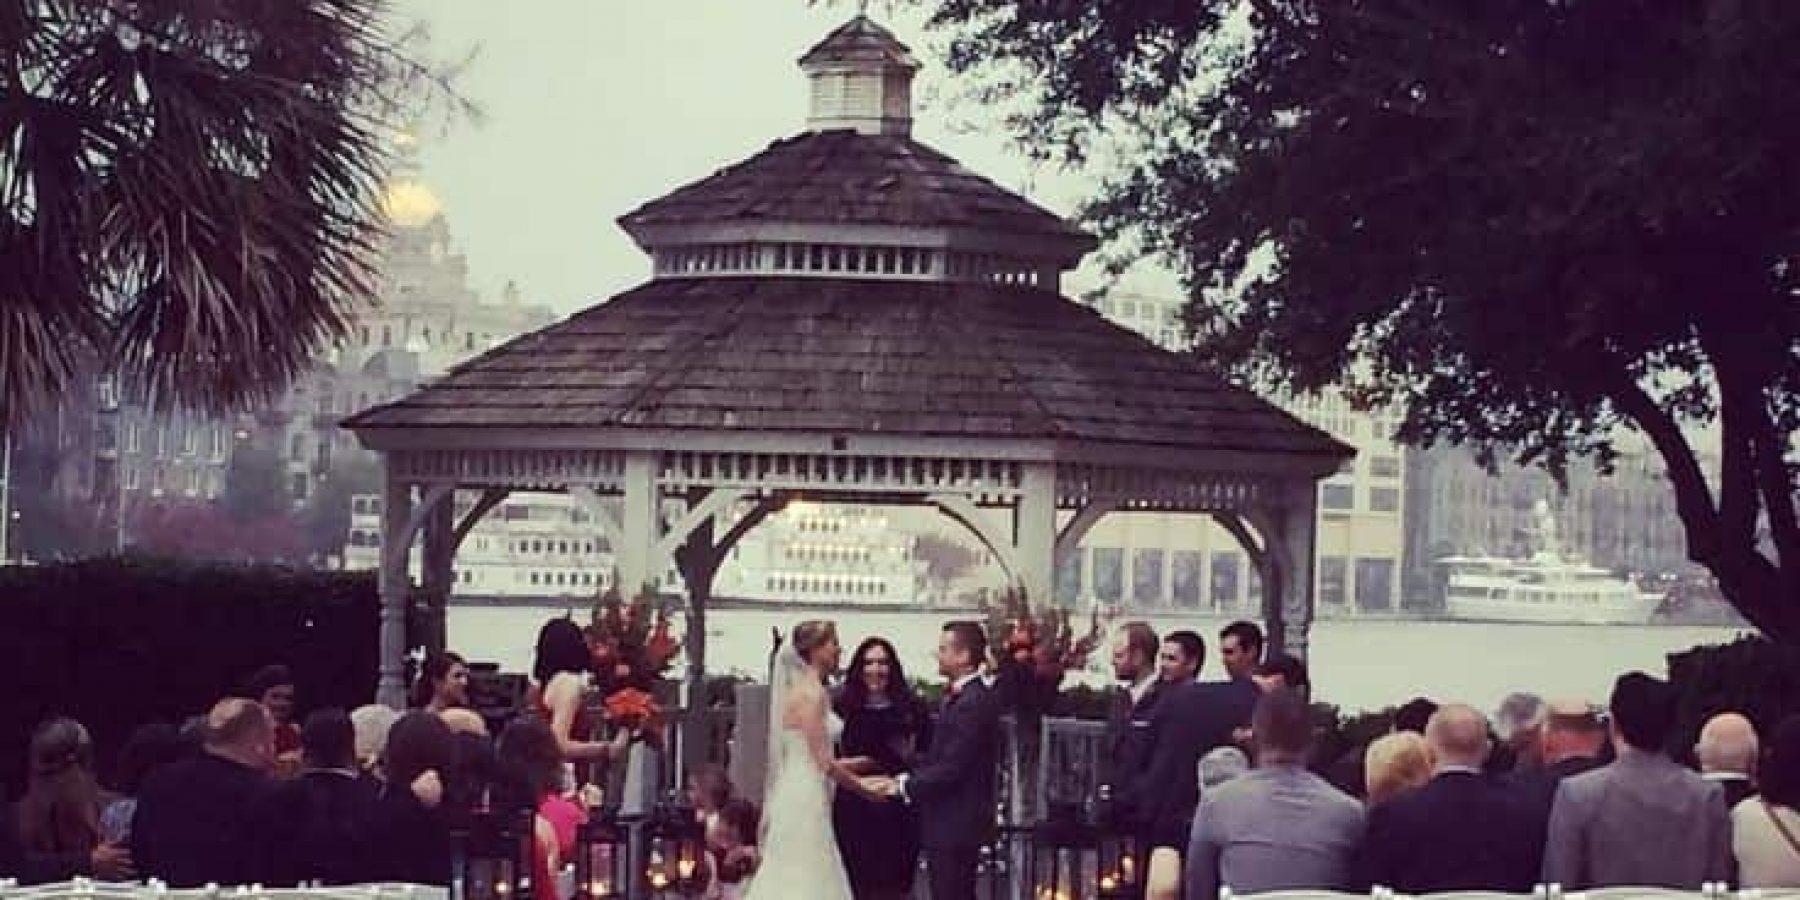 2015 Savannah Wedding Location Review, Part 5- Venues, Coastal GA & SC